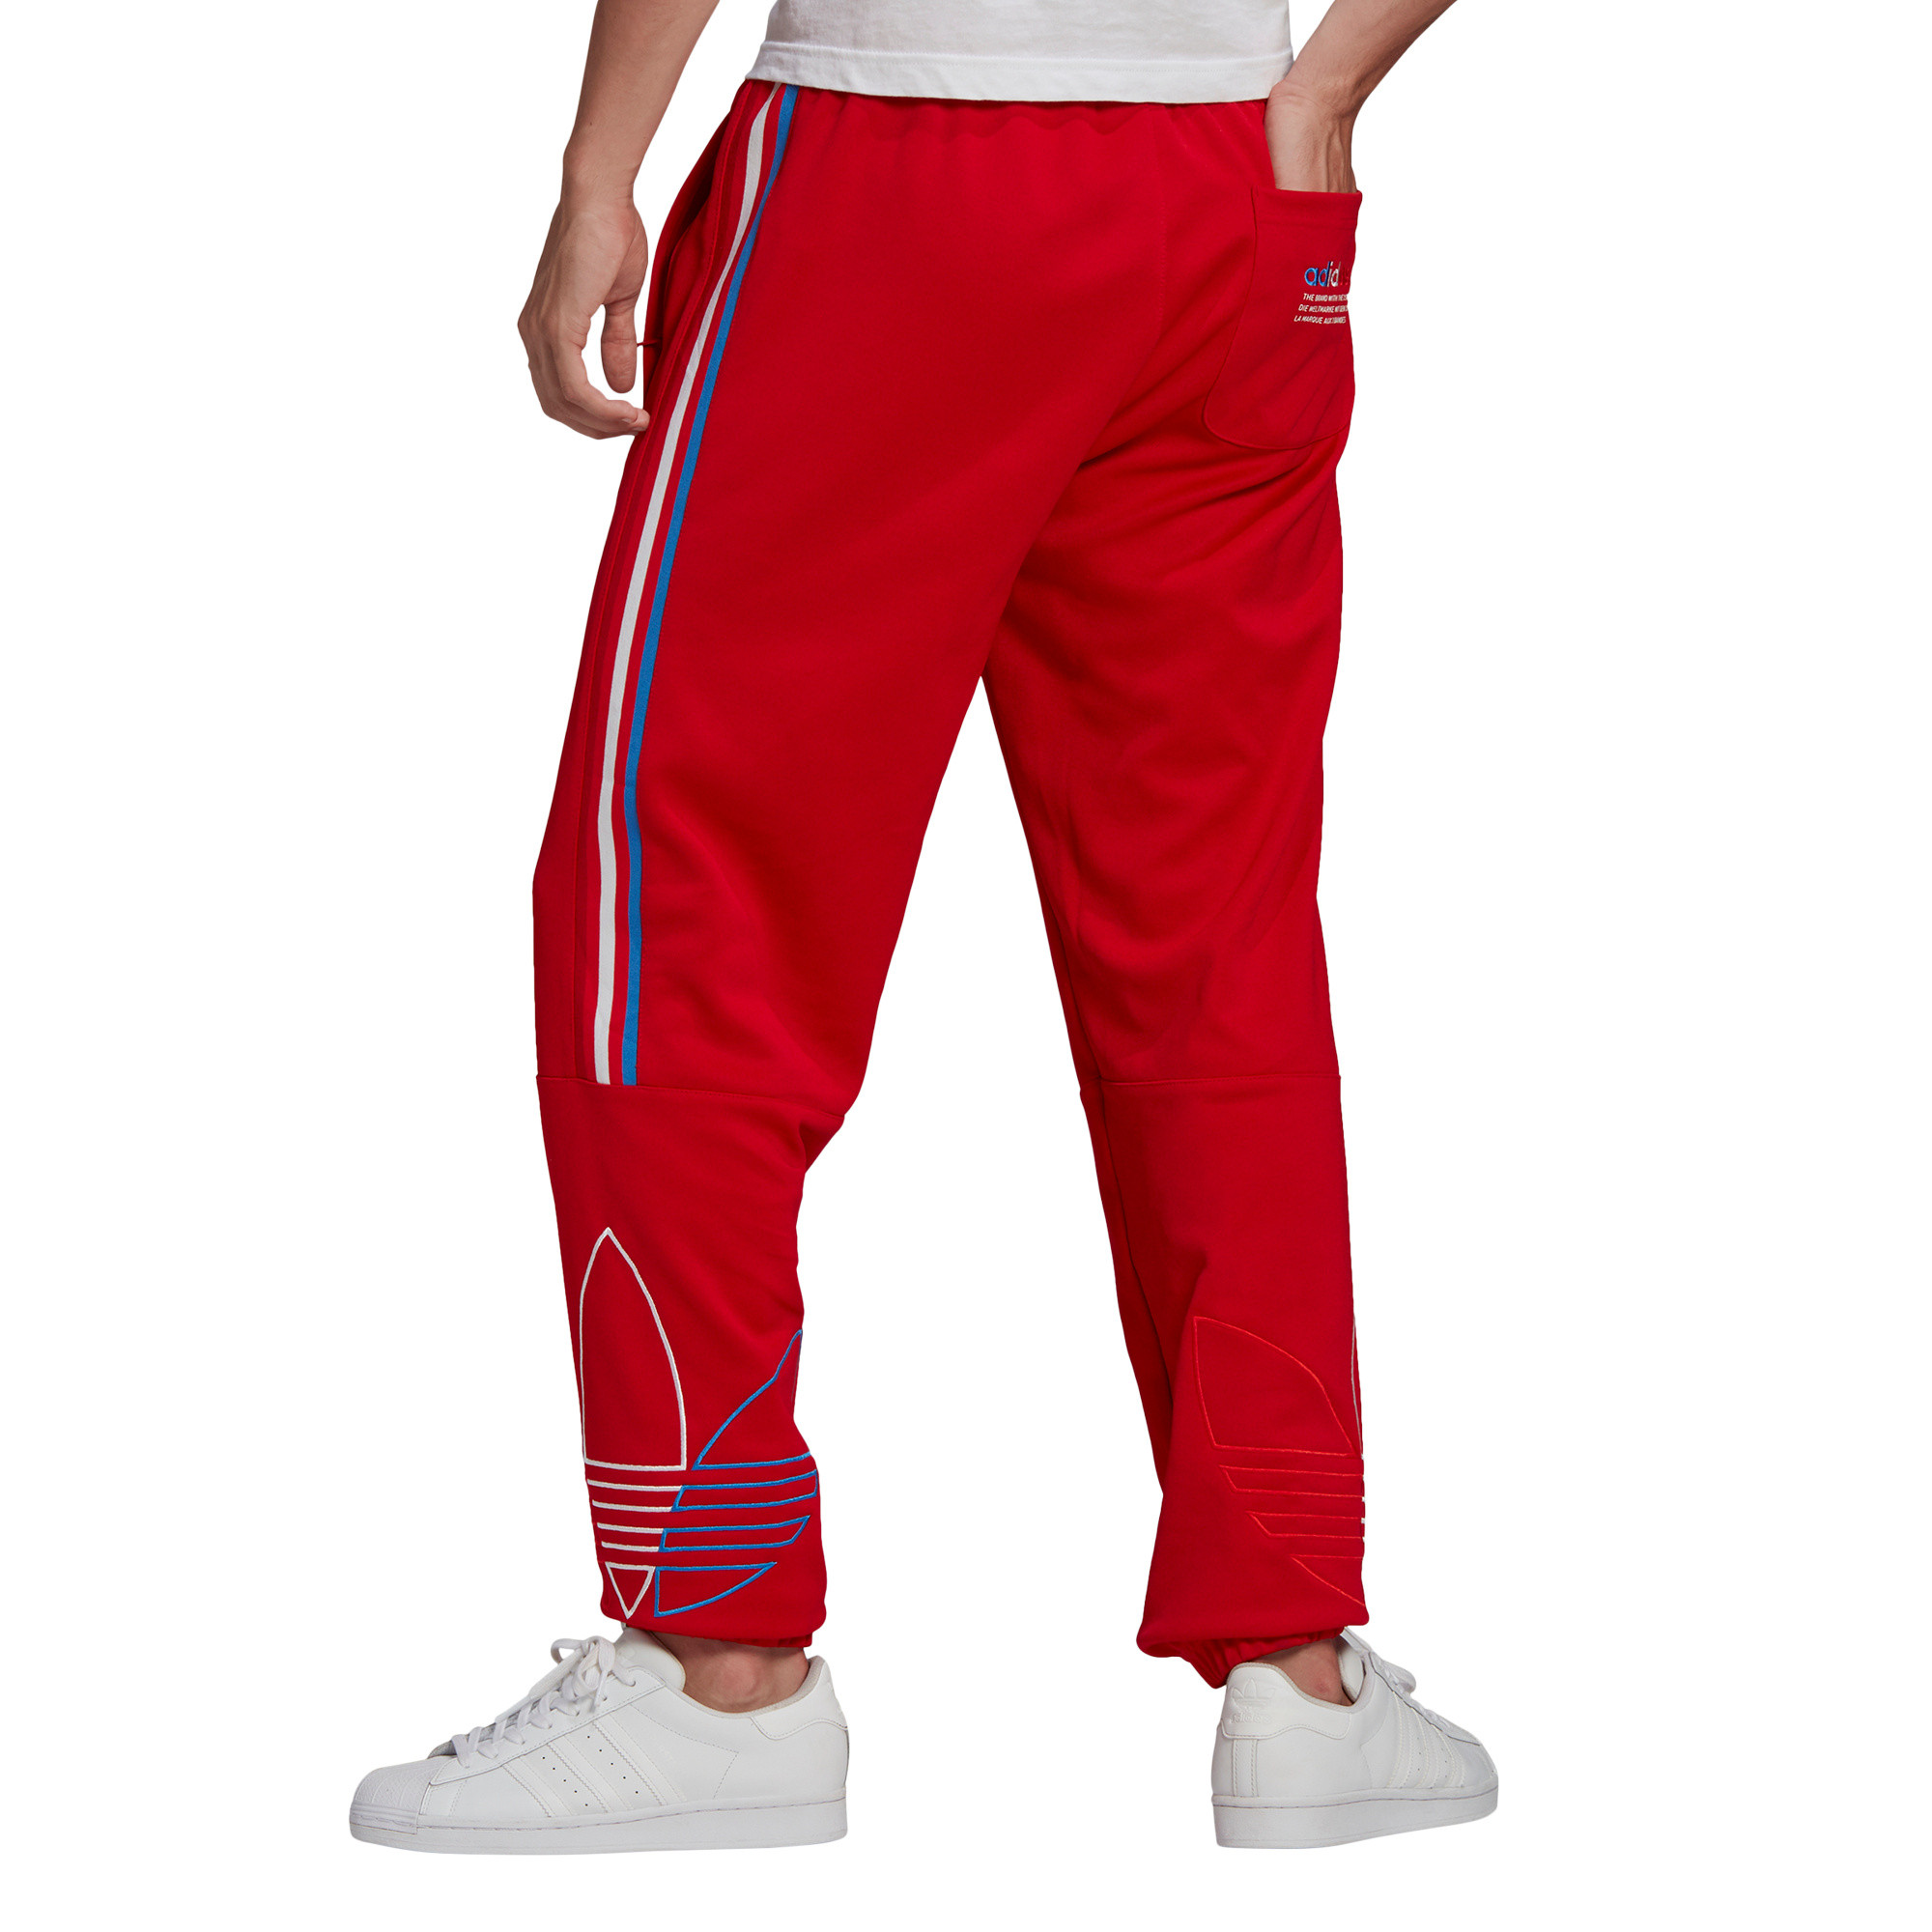 Pantaloni tuta adicolor, Rosso, large image number 2